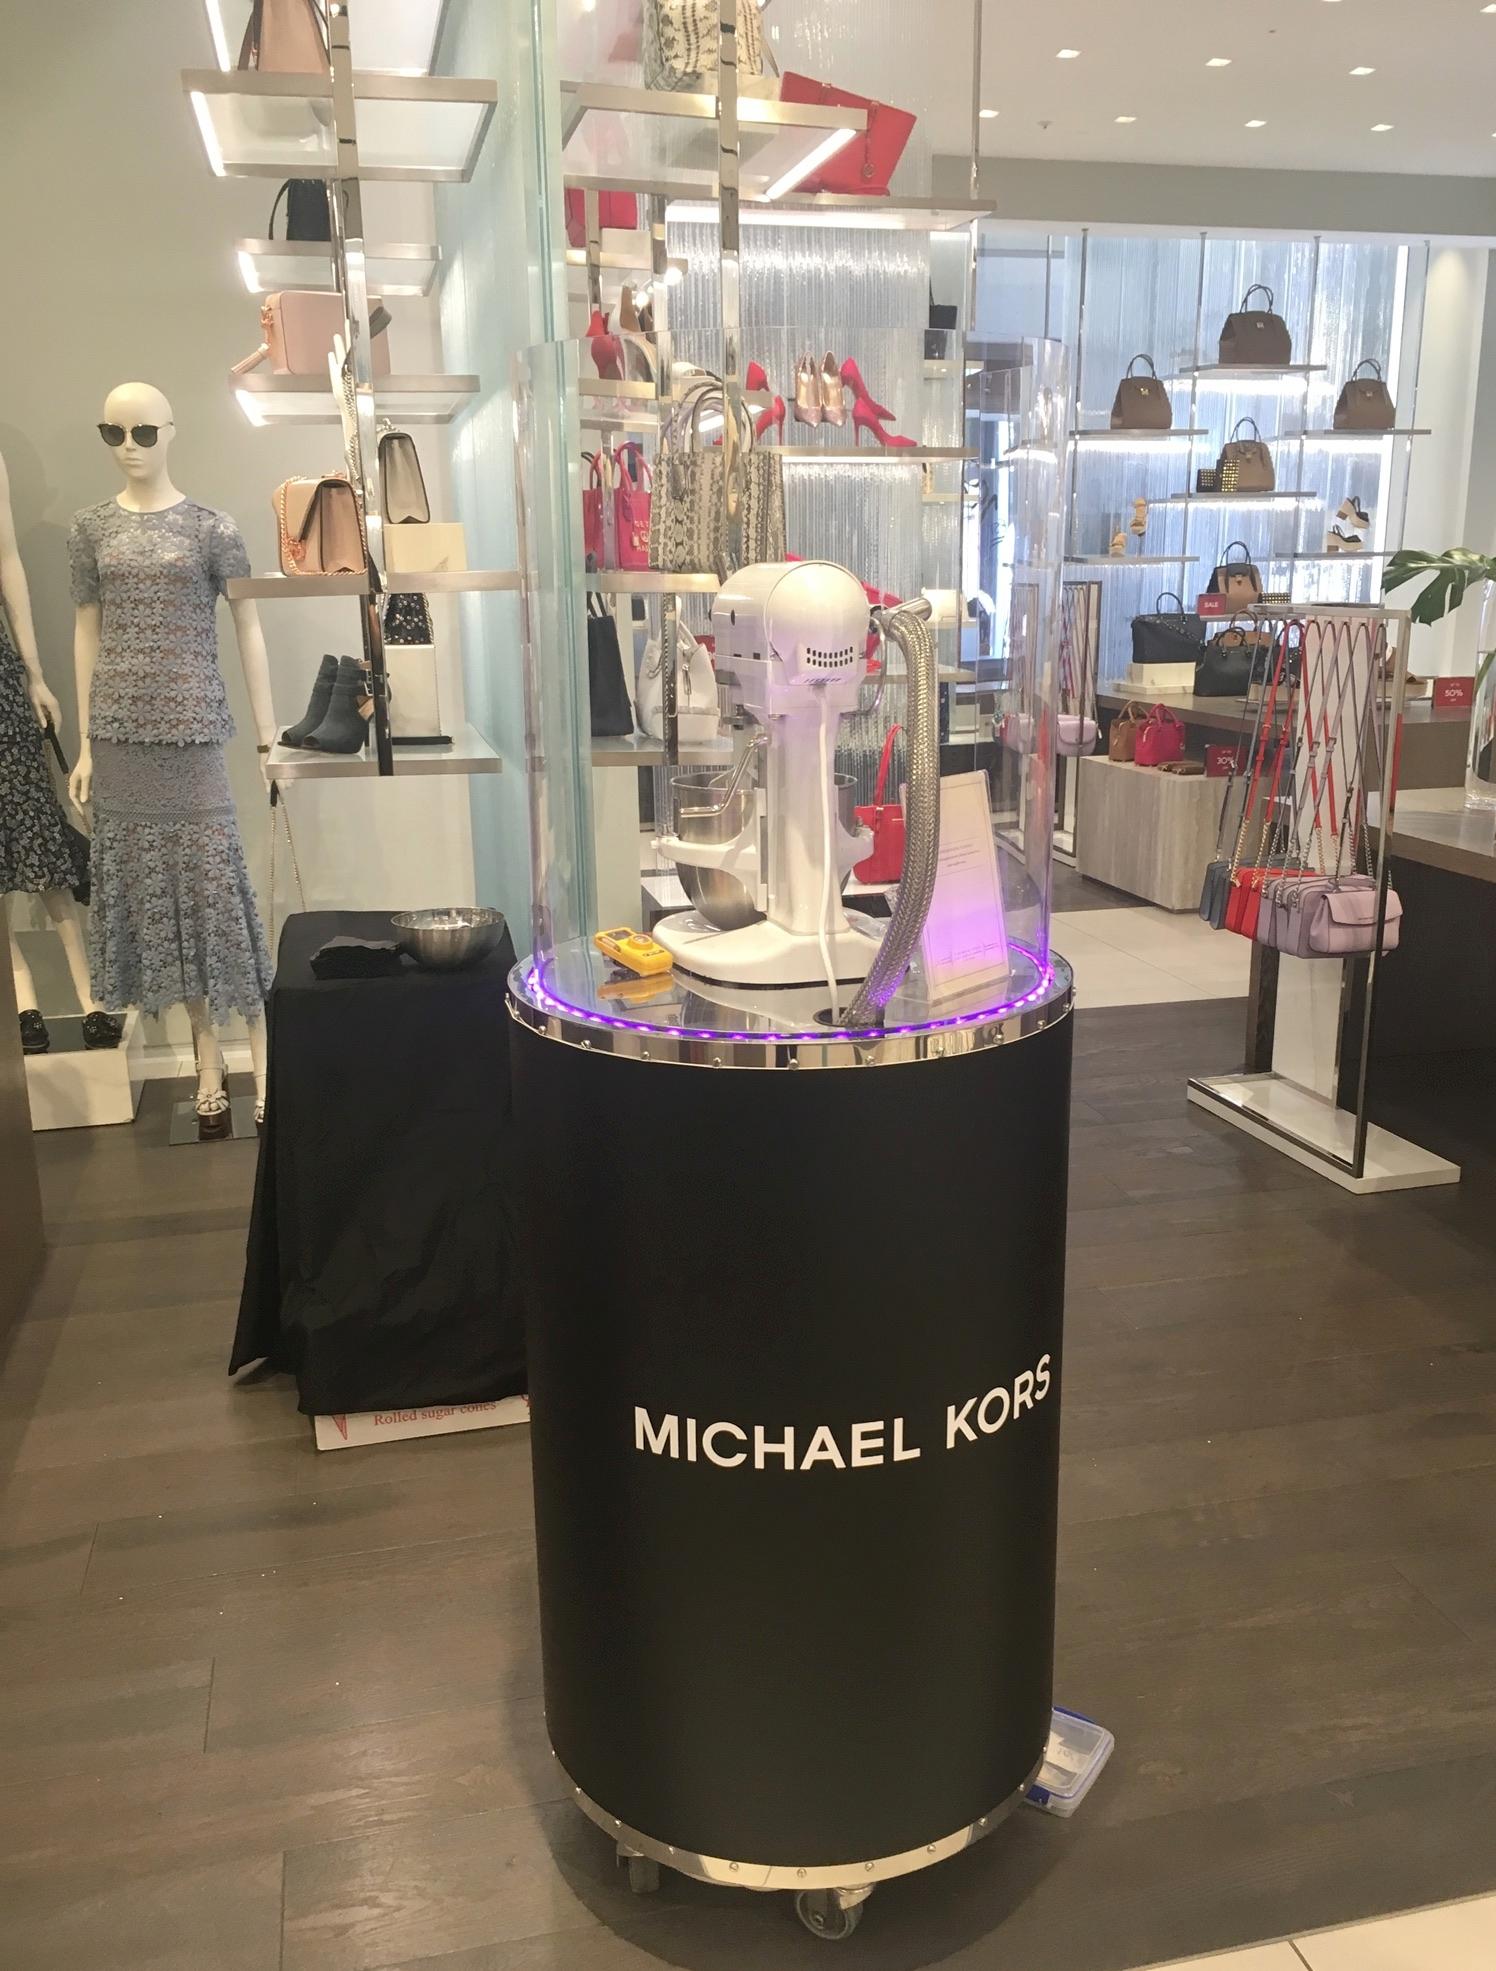 Michael Kors Regents Street Store